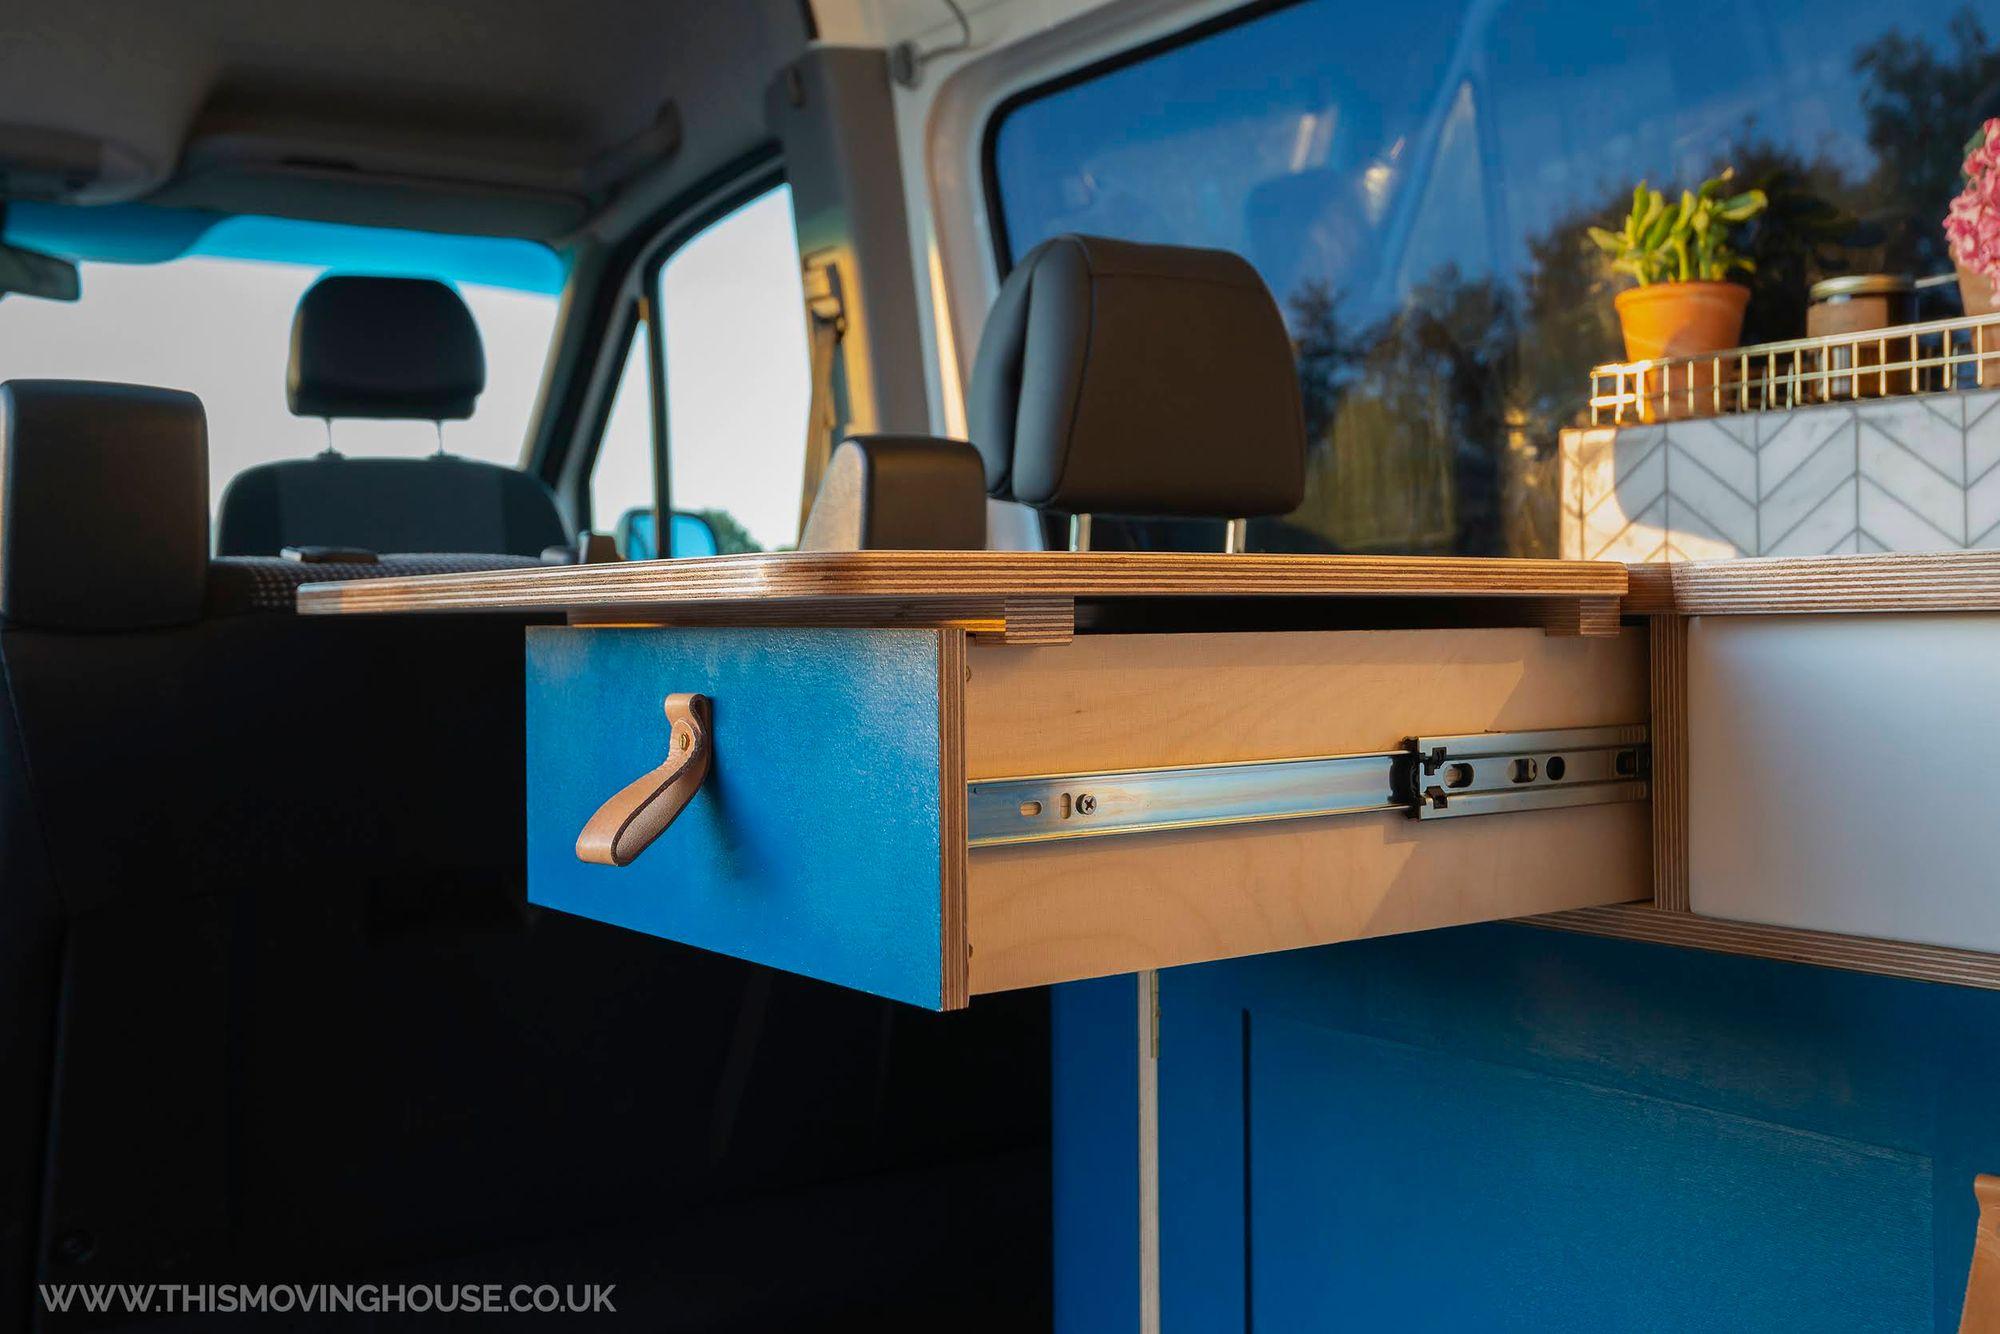 Kitchen Worktop Extension Support In A Camper Van Conversion Moving House Blue Vans Campervan Interior